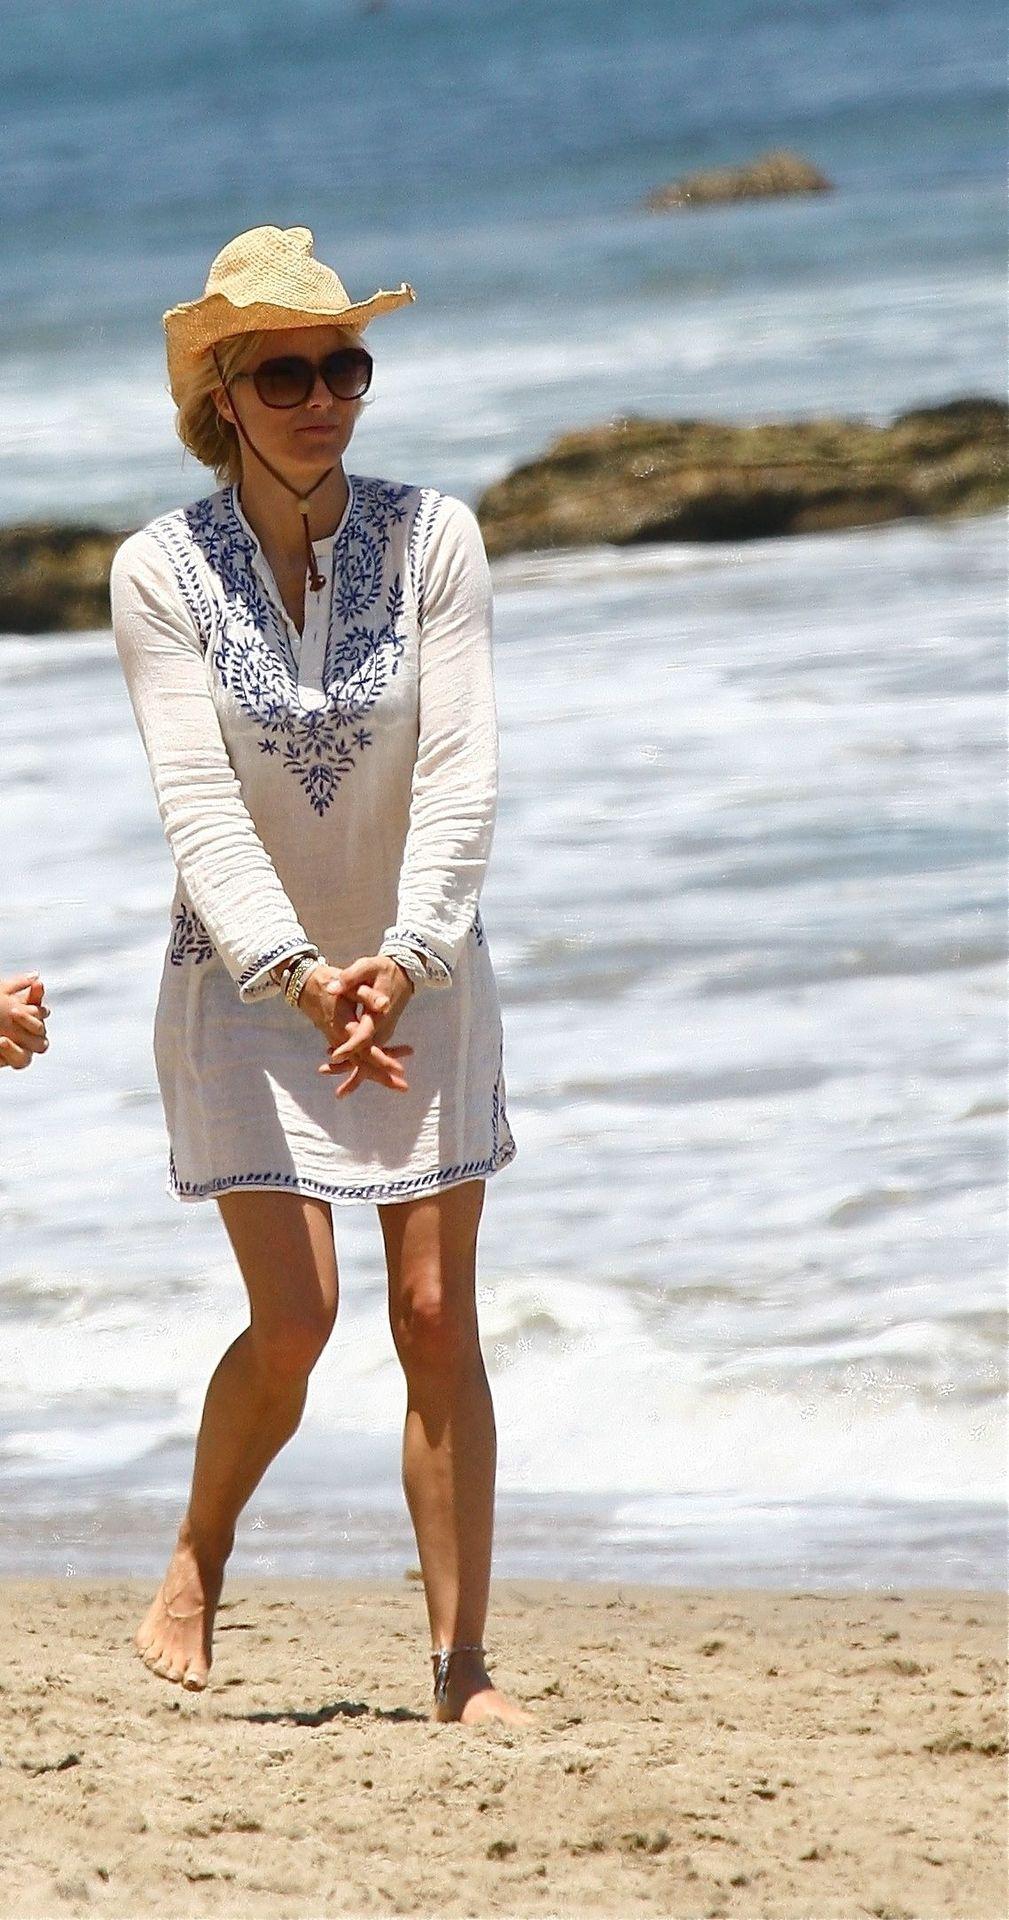 Téa Leoni & David Duchovny Display Their Beach Bodies in Malibu (25 Photos)